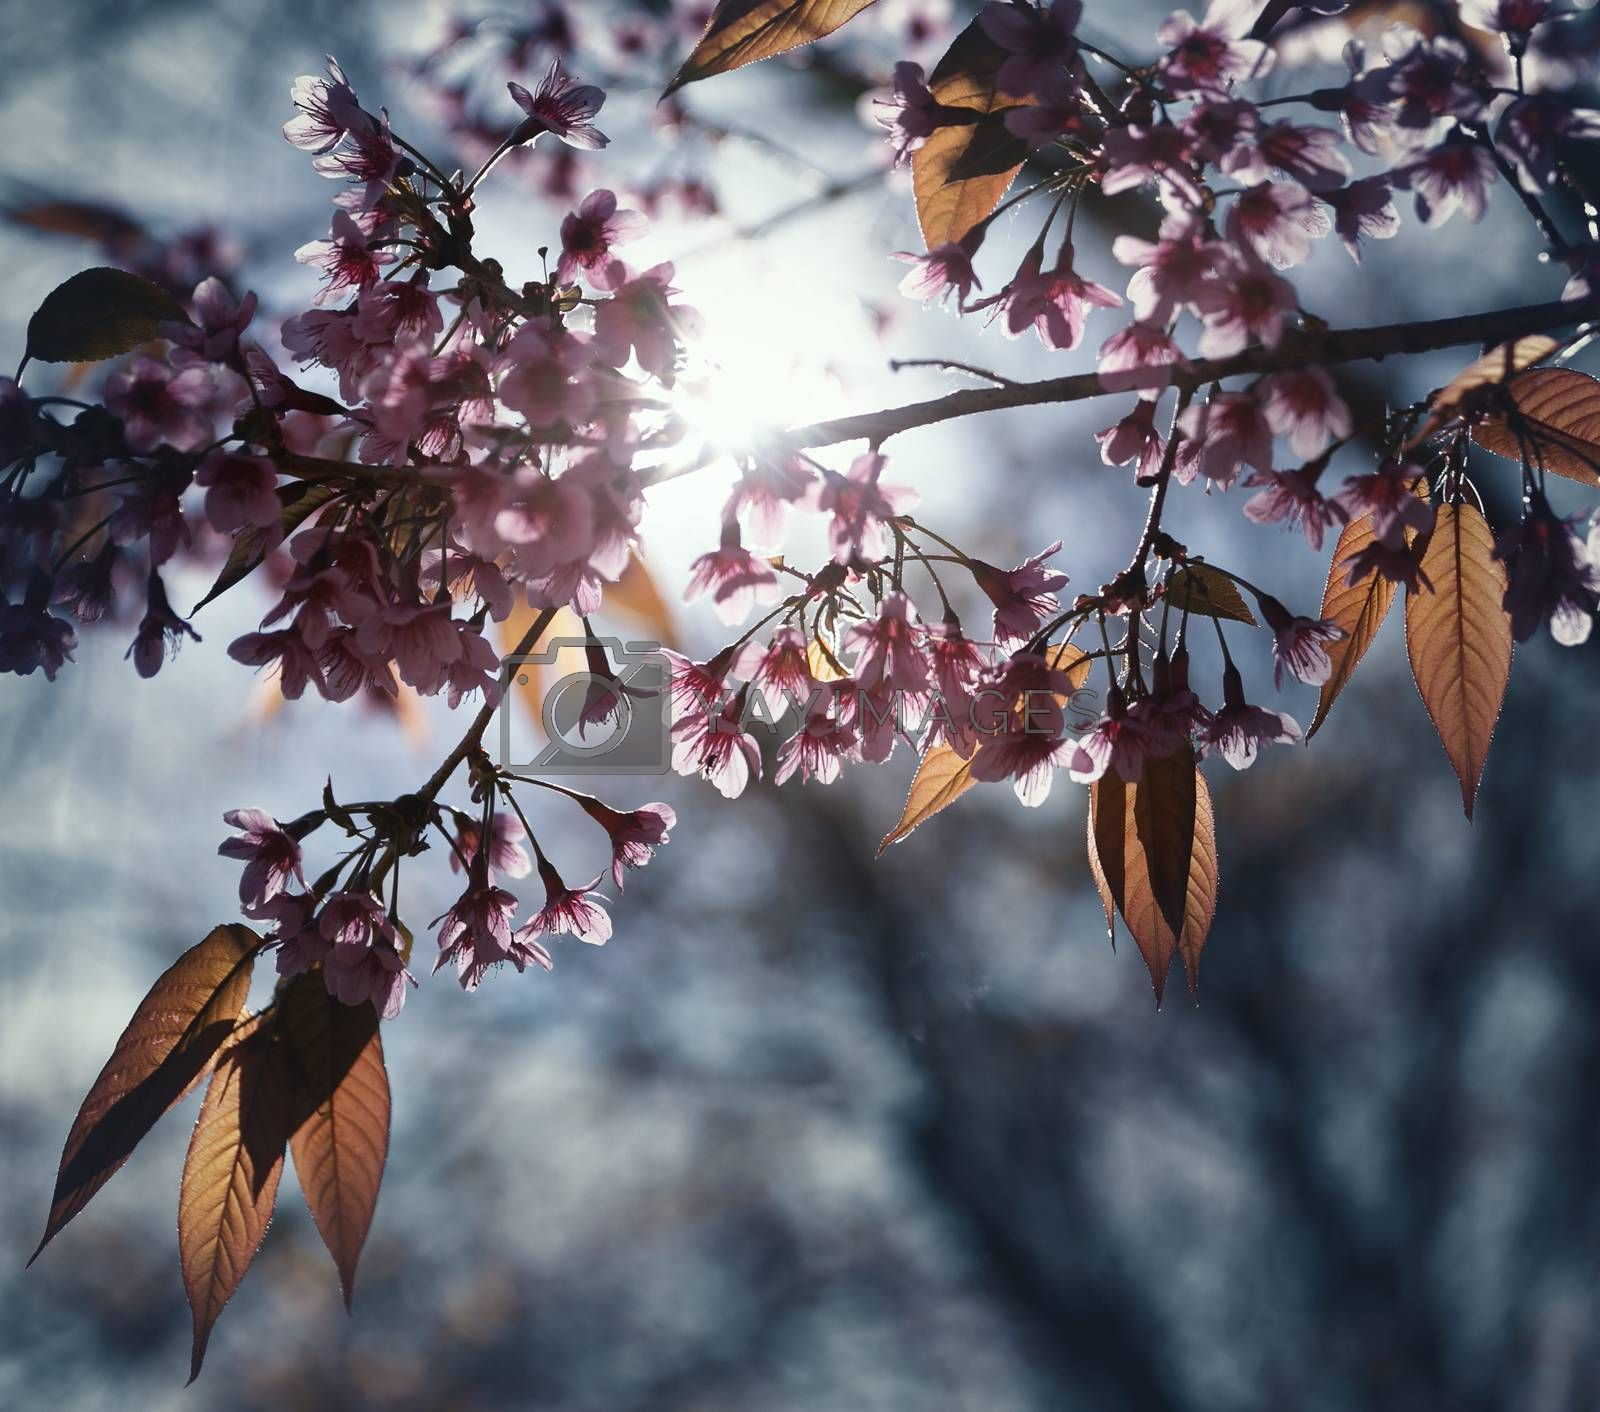 Beautiful Cherry Blossom  or Sakura flower on nature background, by Chokchai